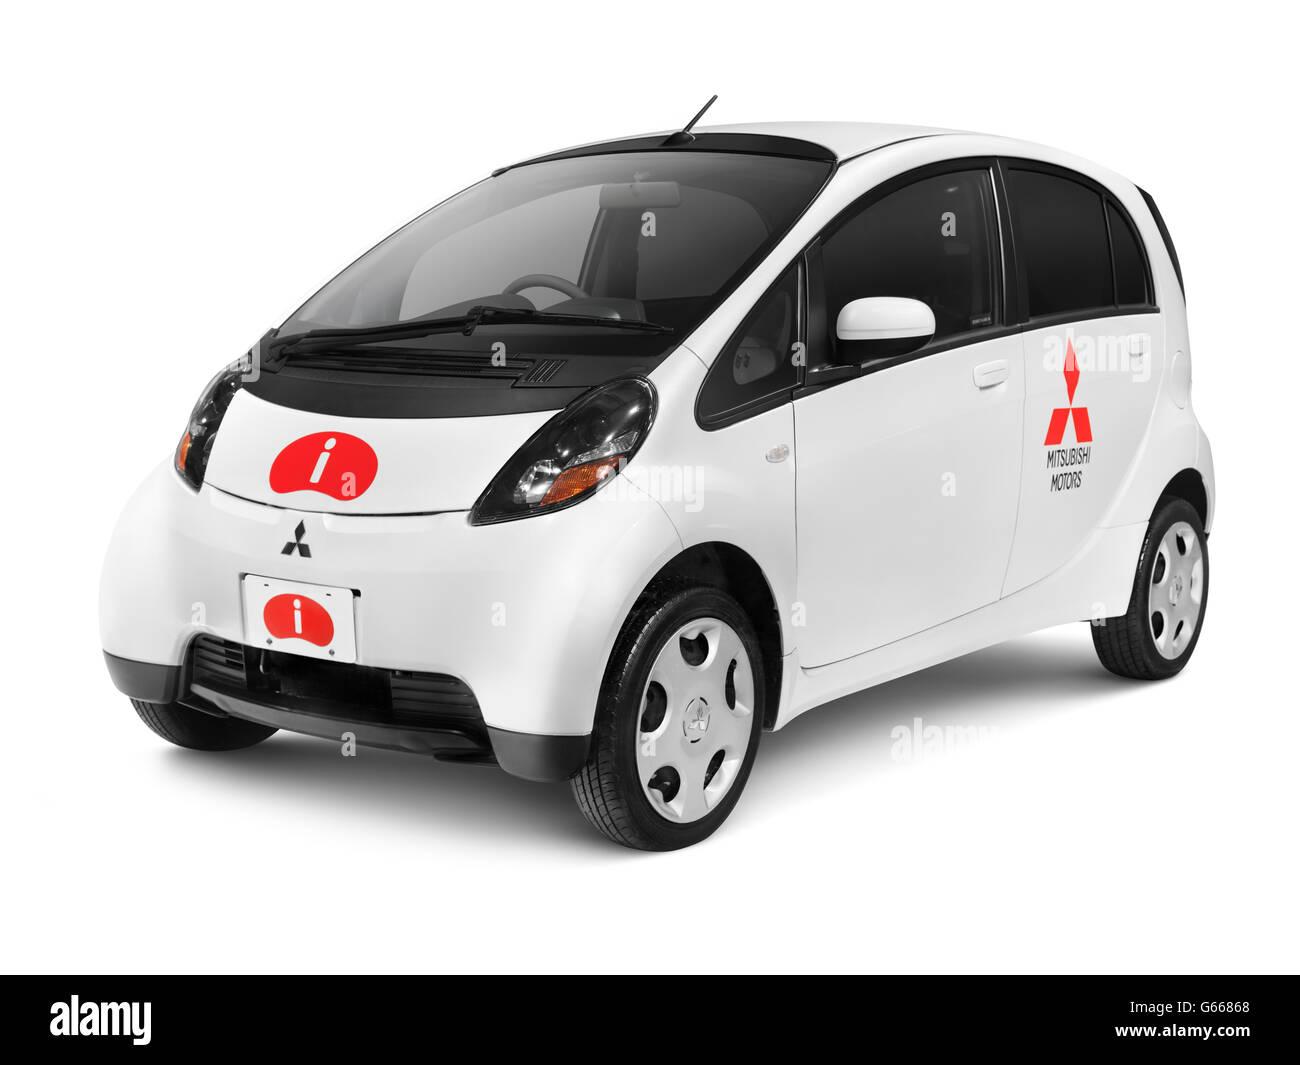 2010 Mitsubishi i kei, small city car - Stock Image